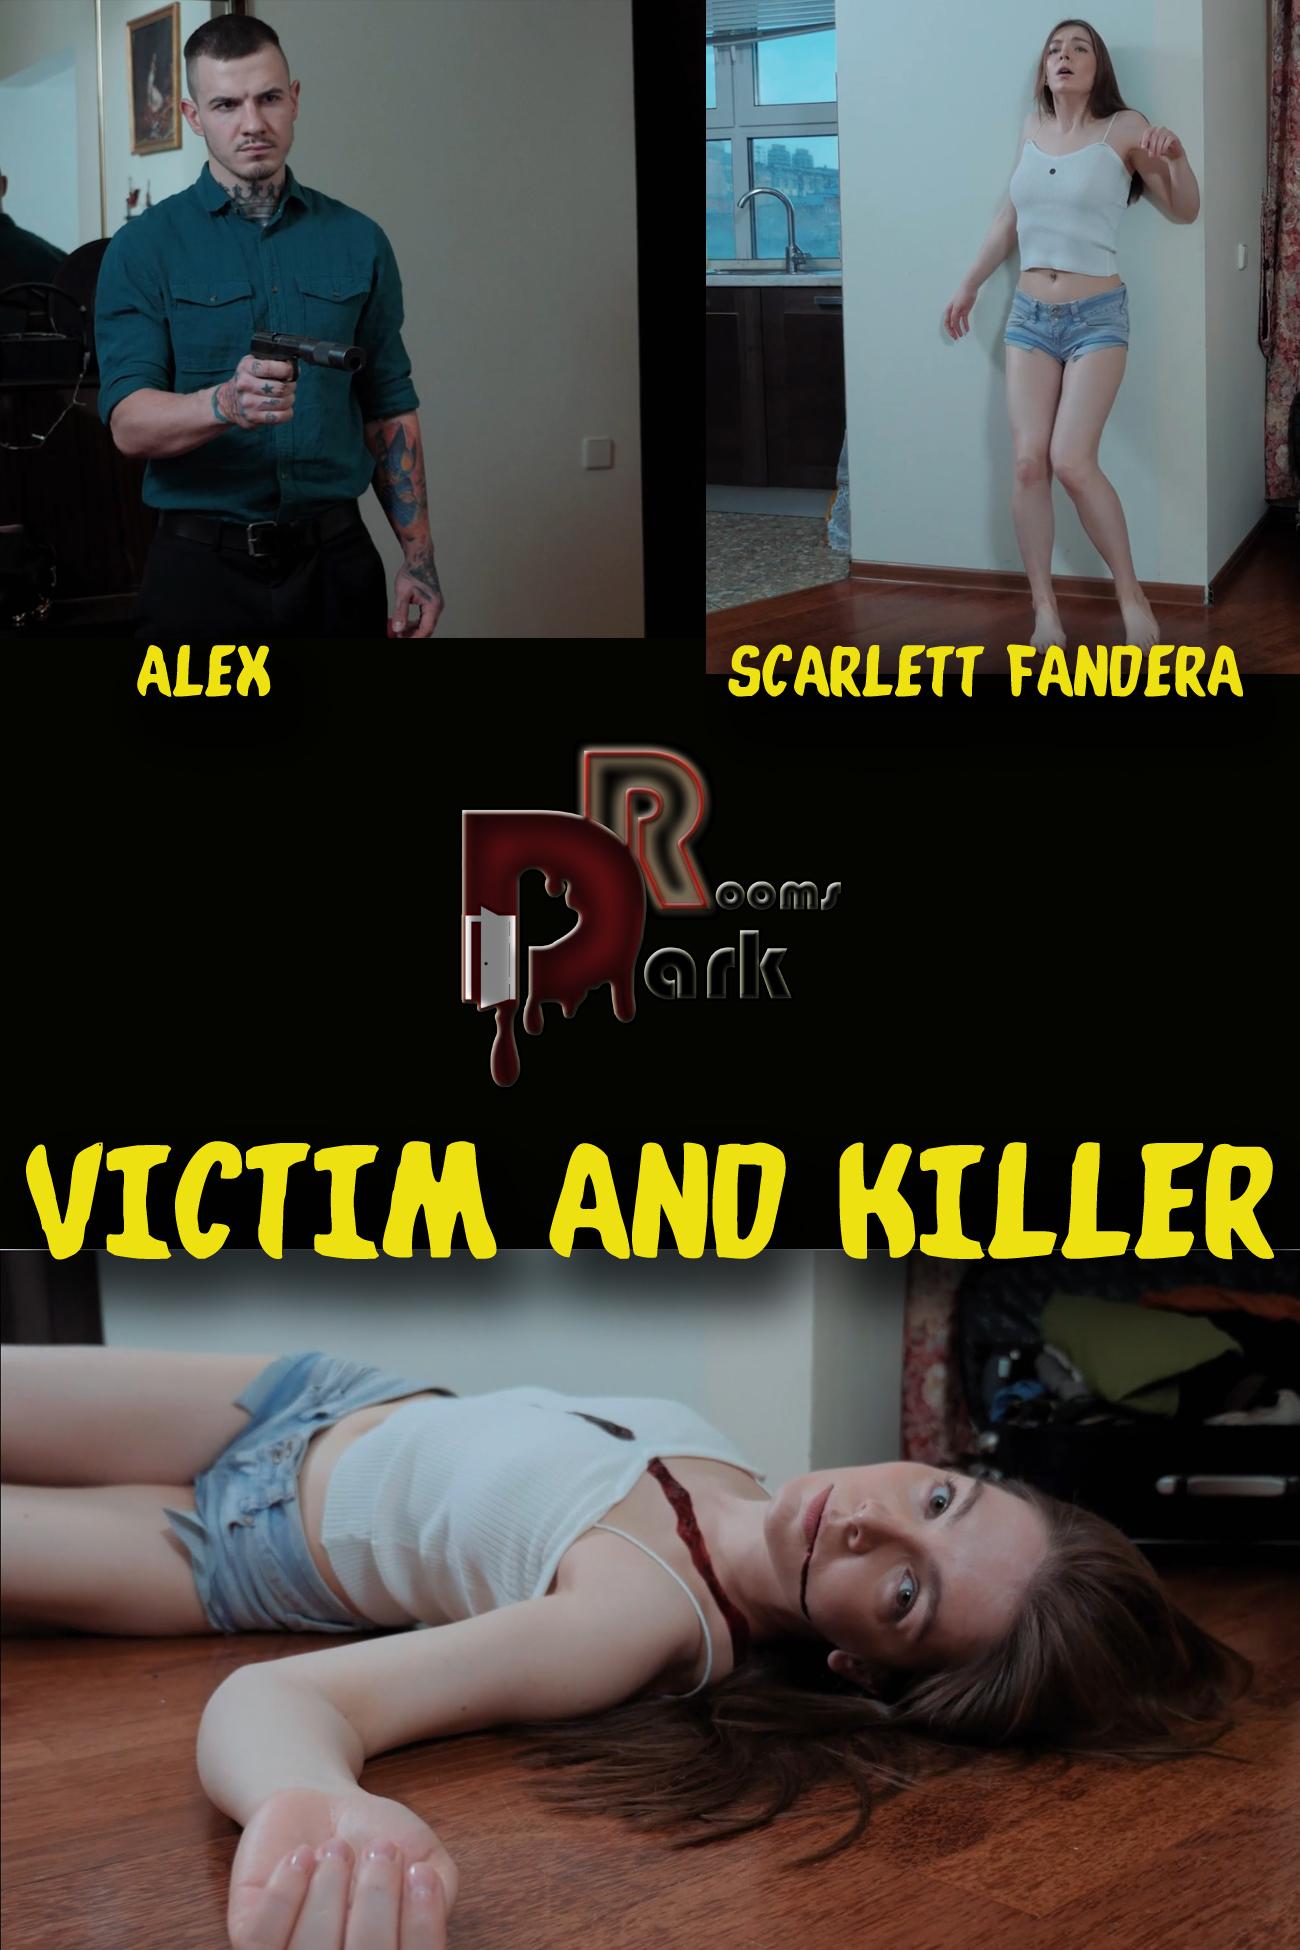 VICTIM AND KILLER